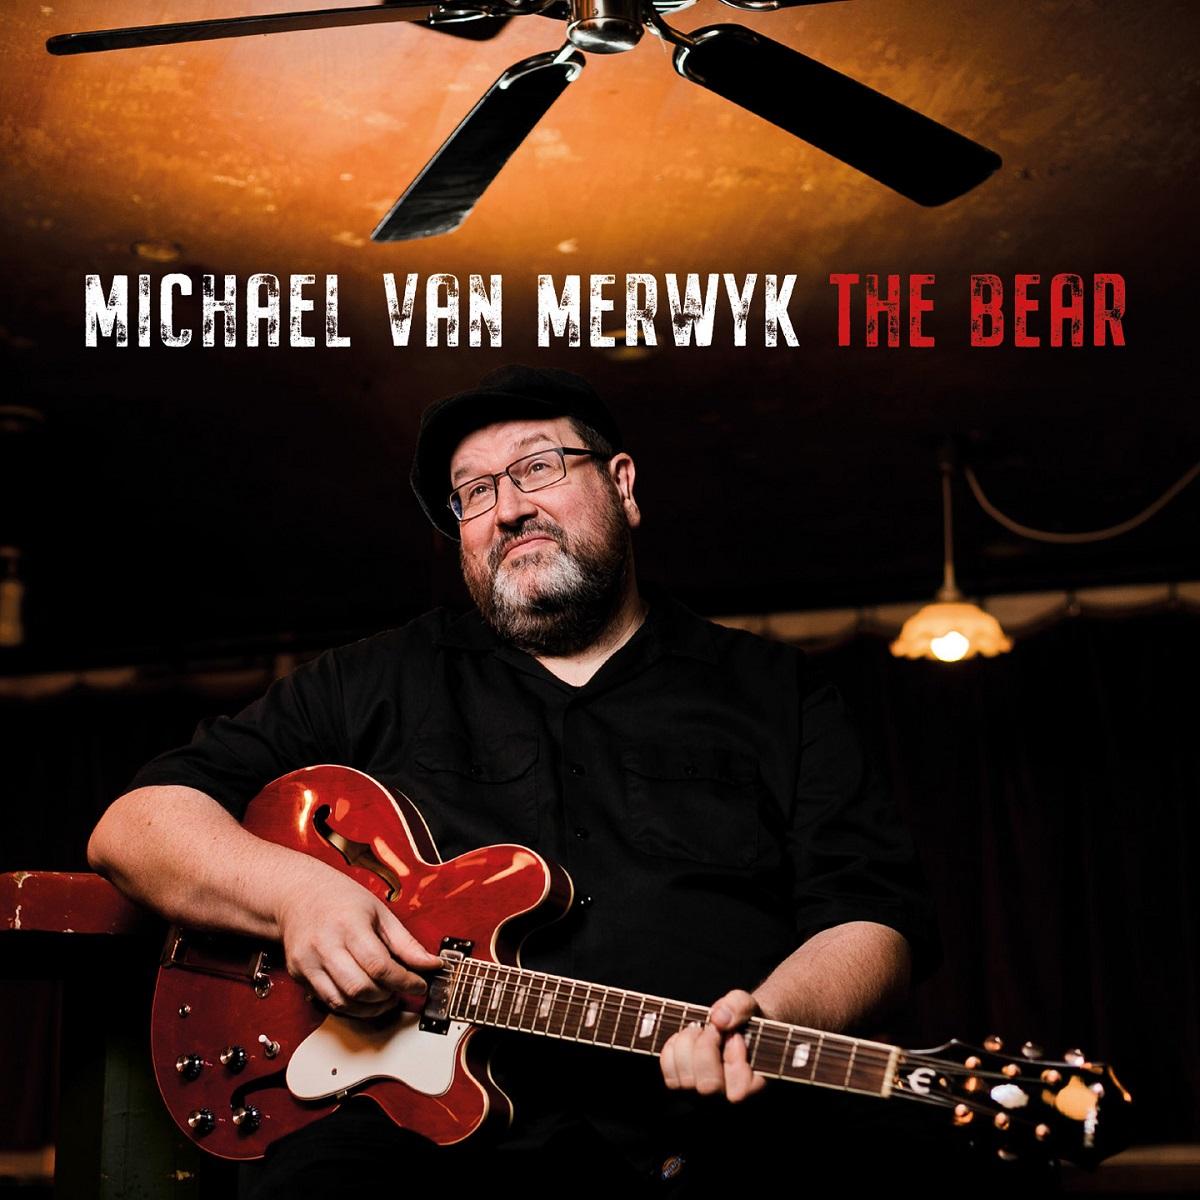 Michael Van Merwyk - The Bear